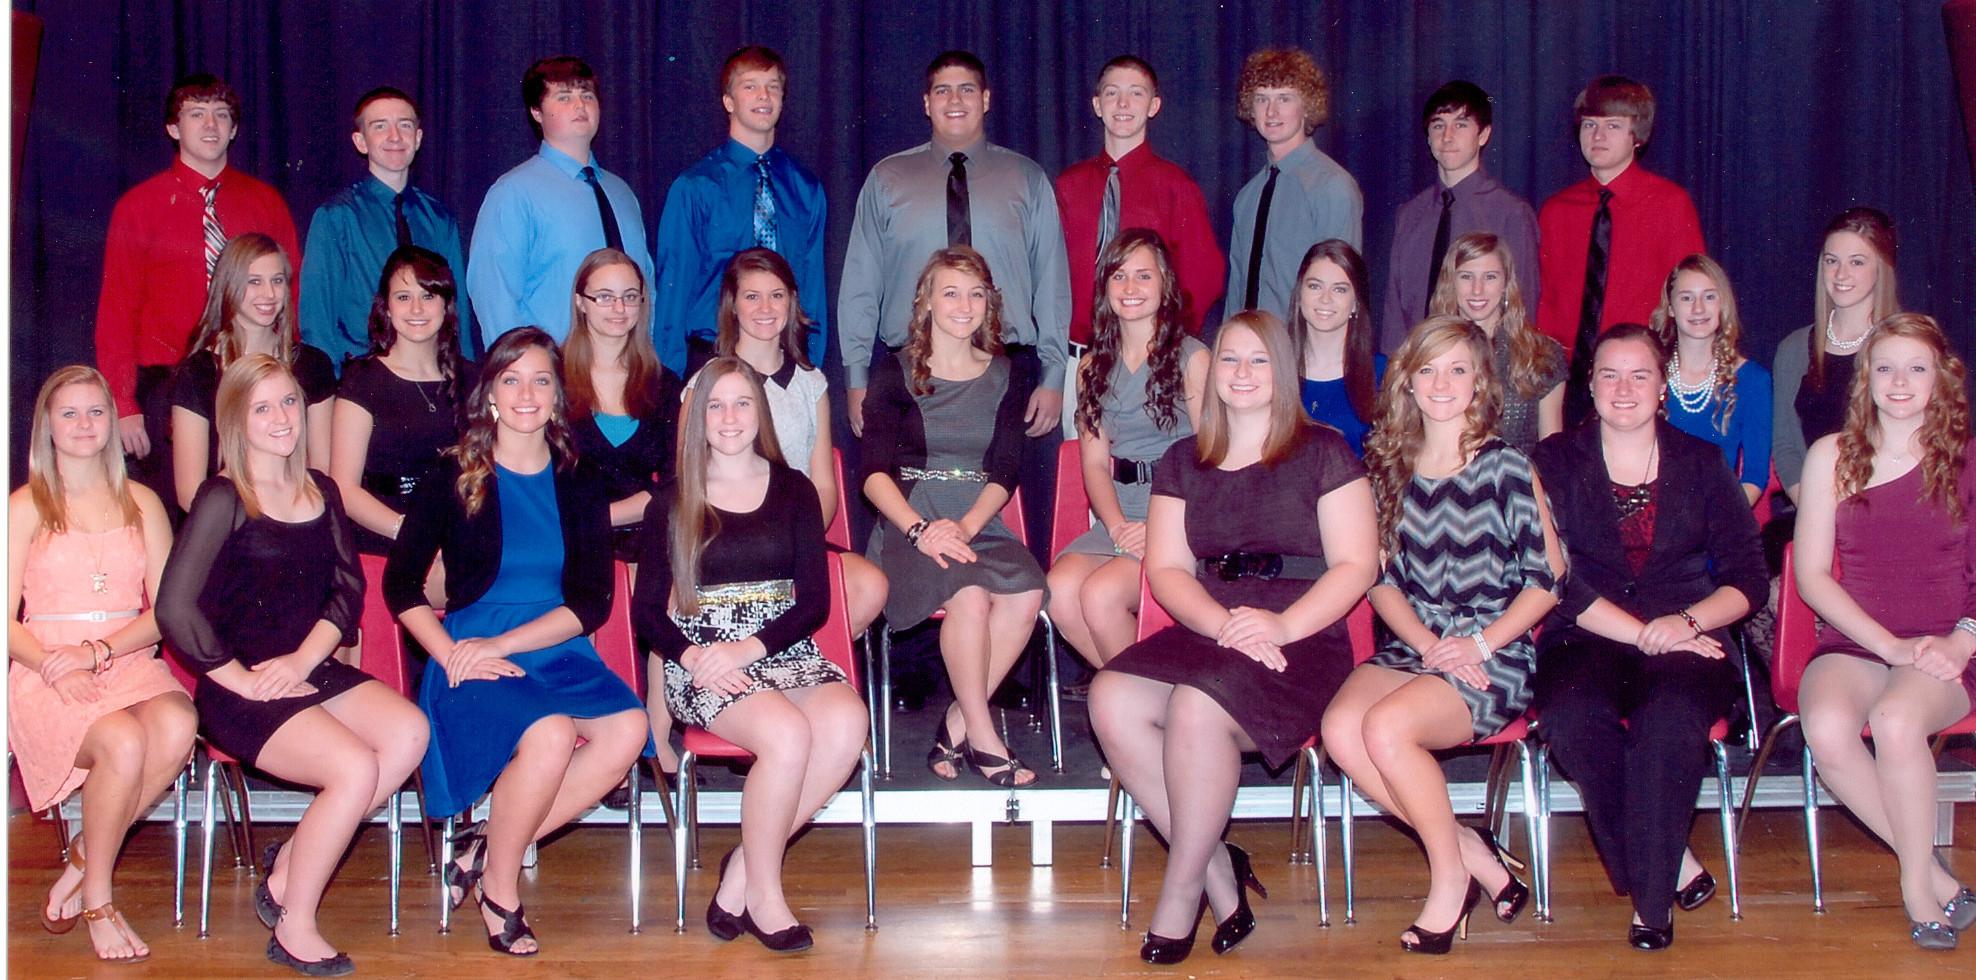 national honor society application leadership essay